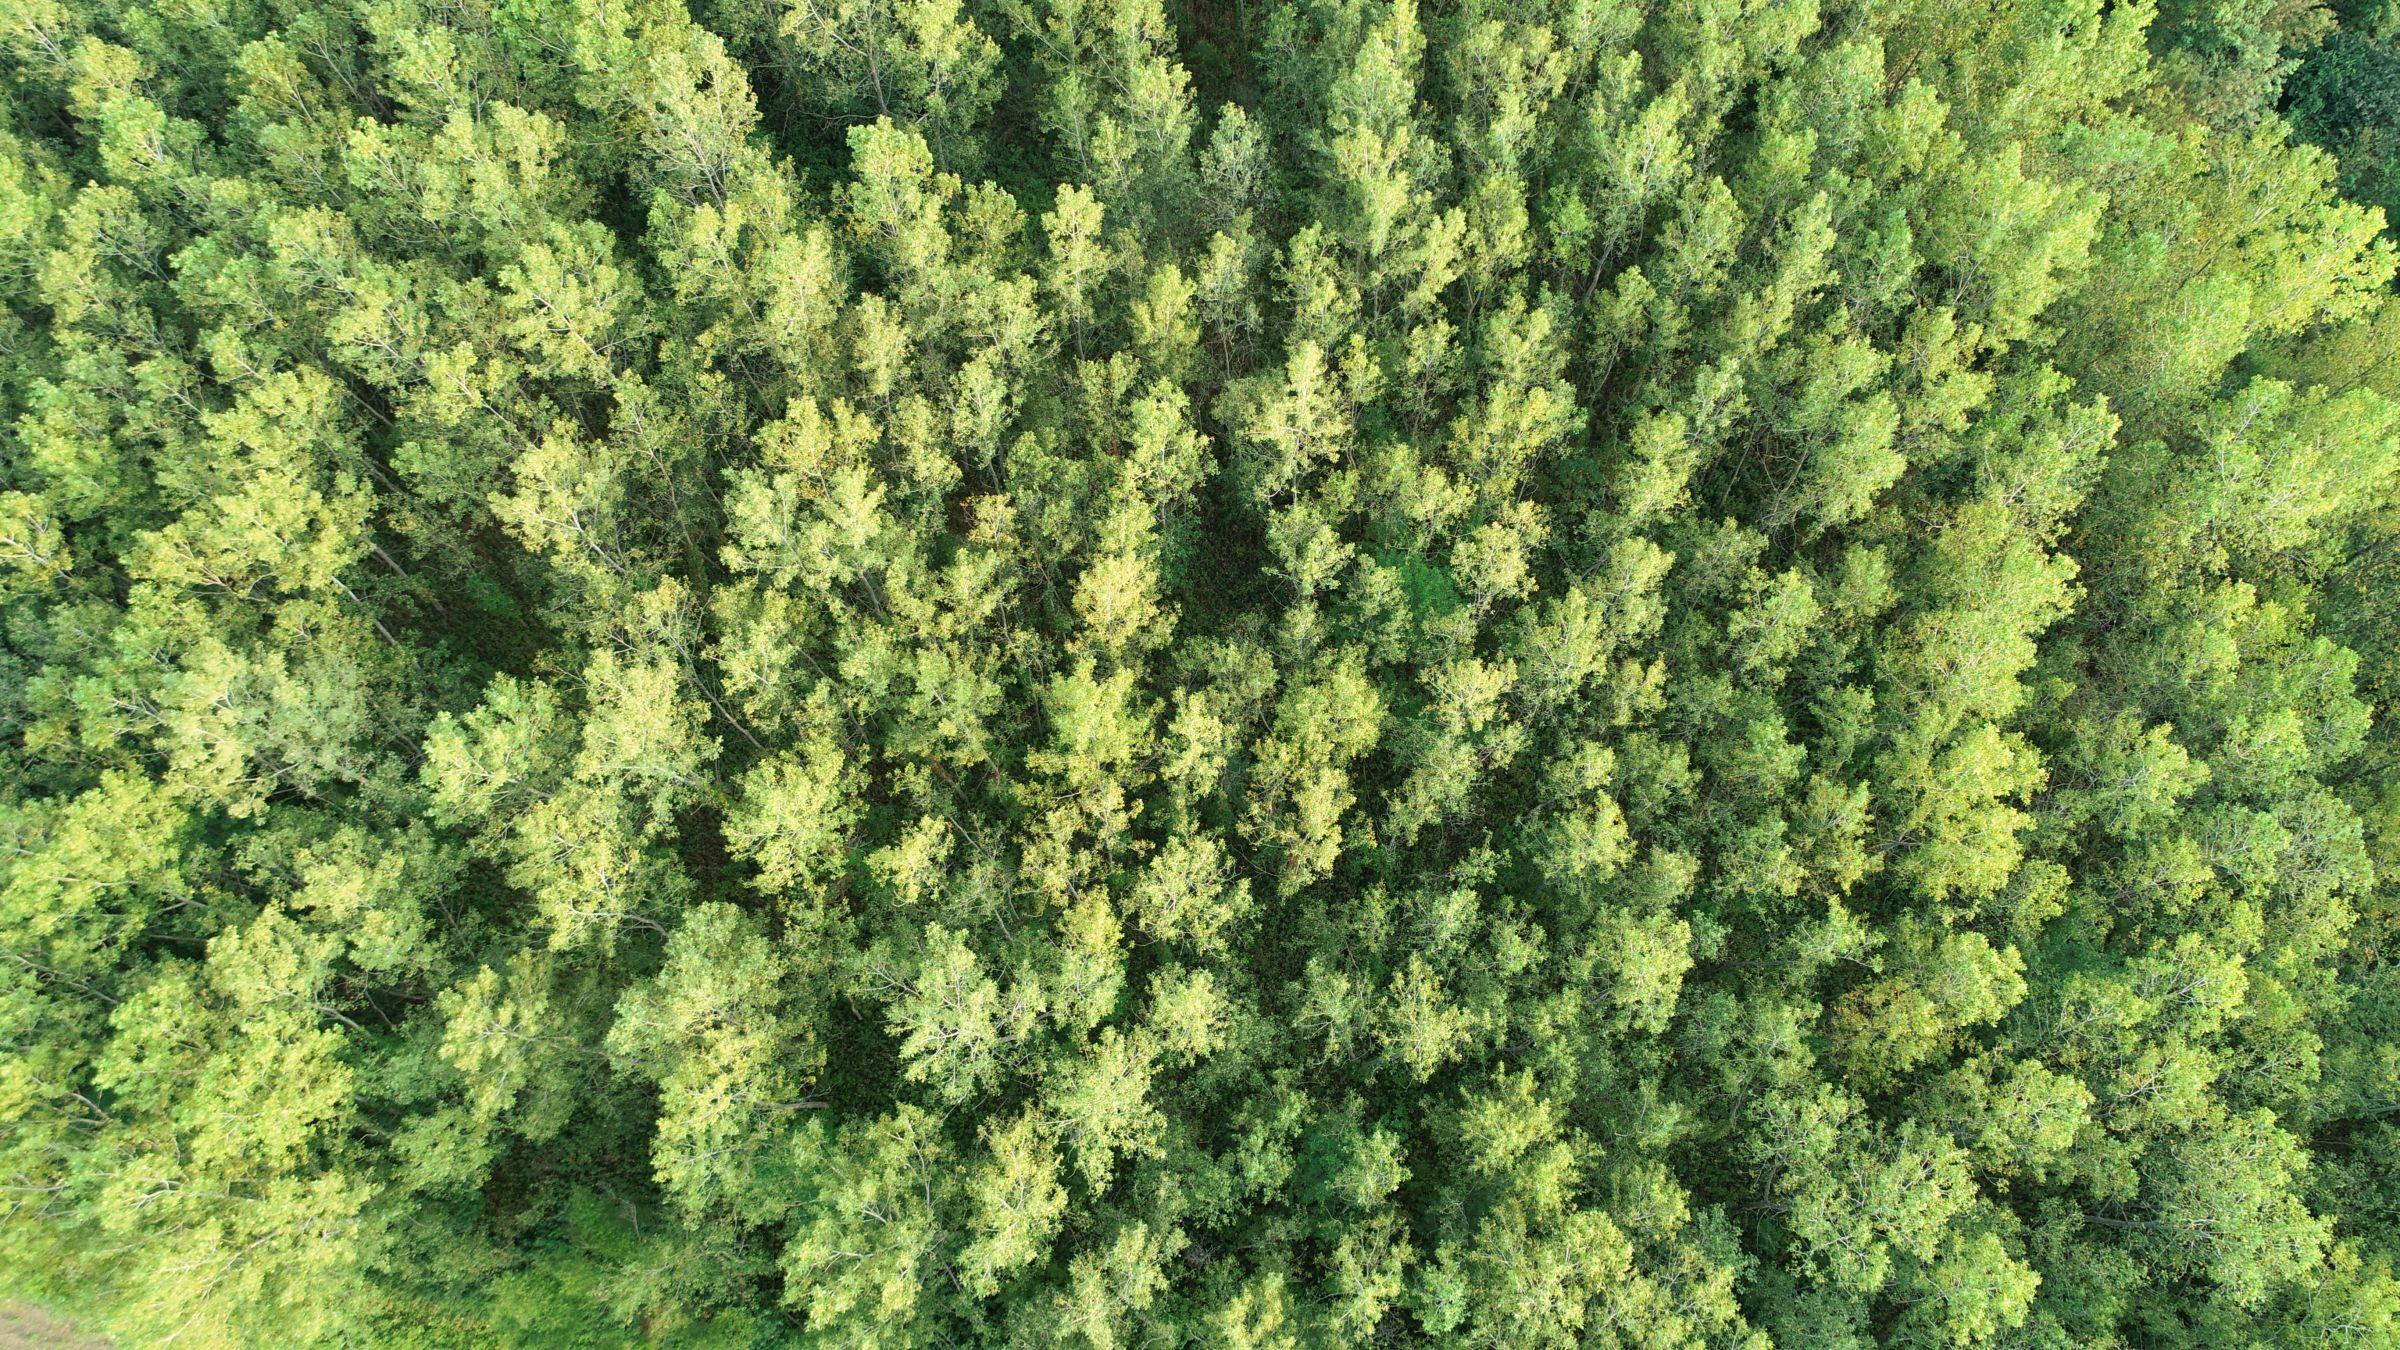 land-lee-county-iowa-328-acres-listing-number-15137-8-2020-08-27-175039.jpg